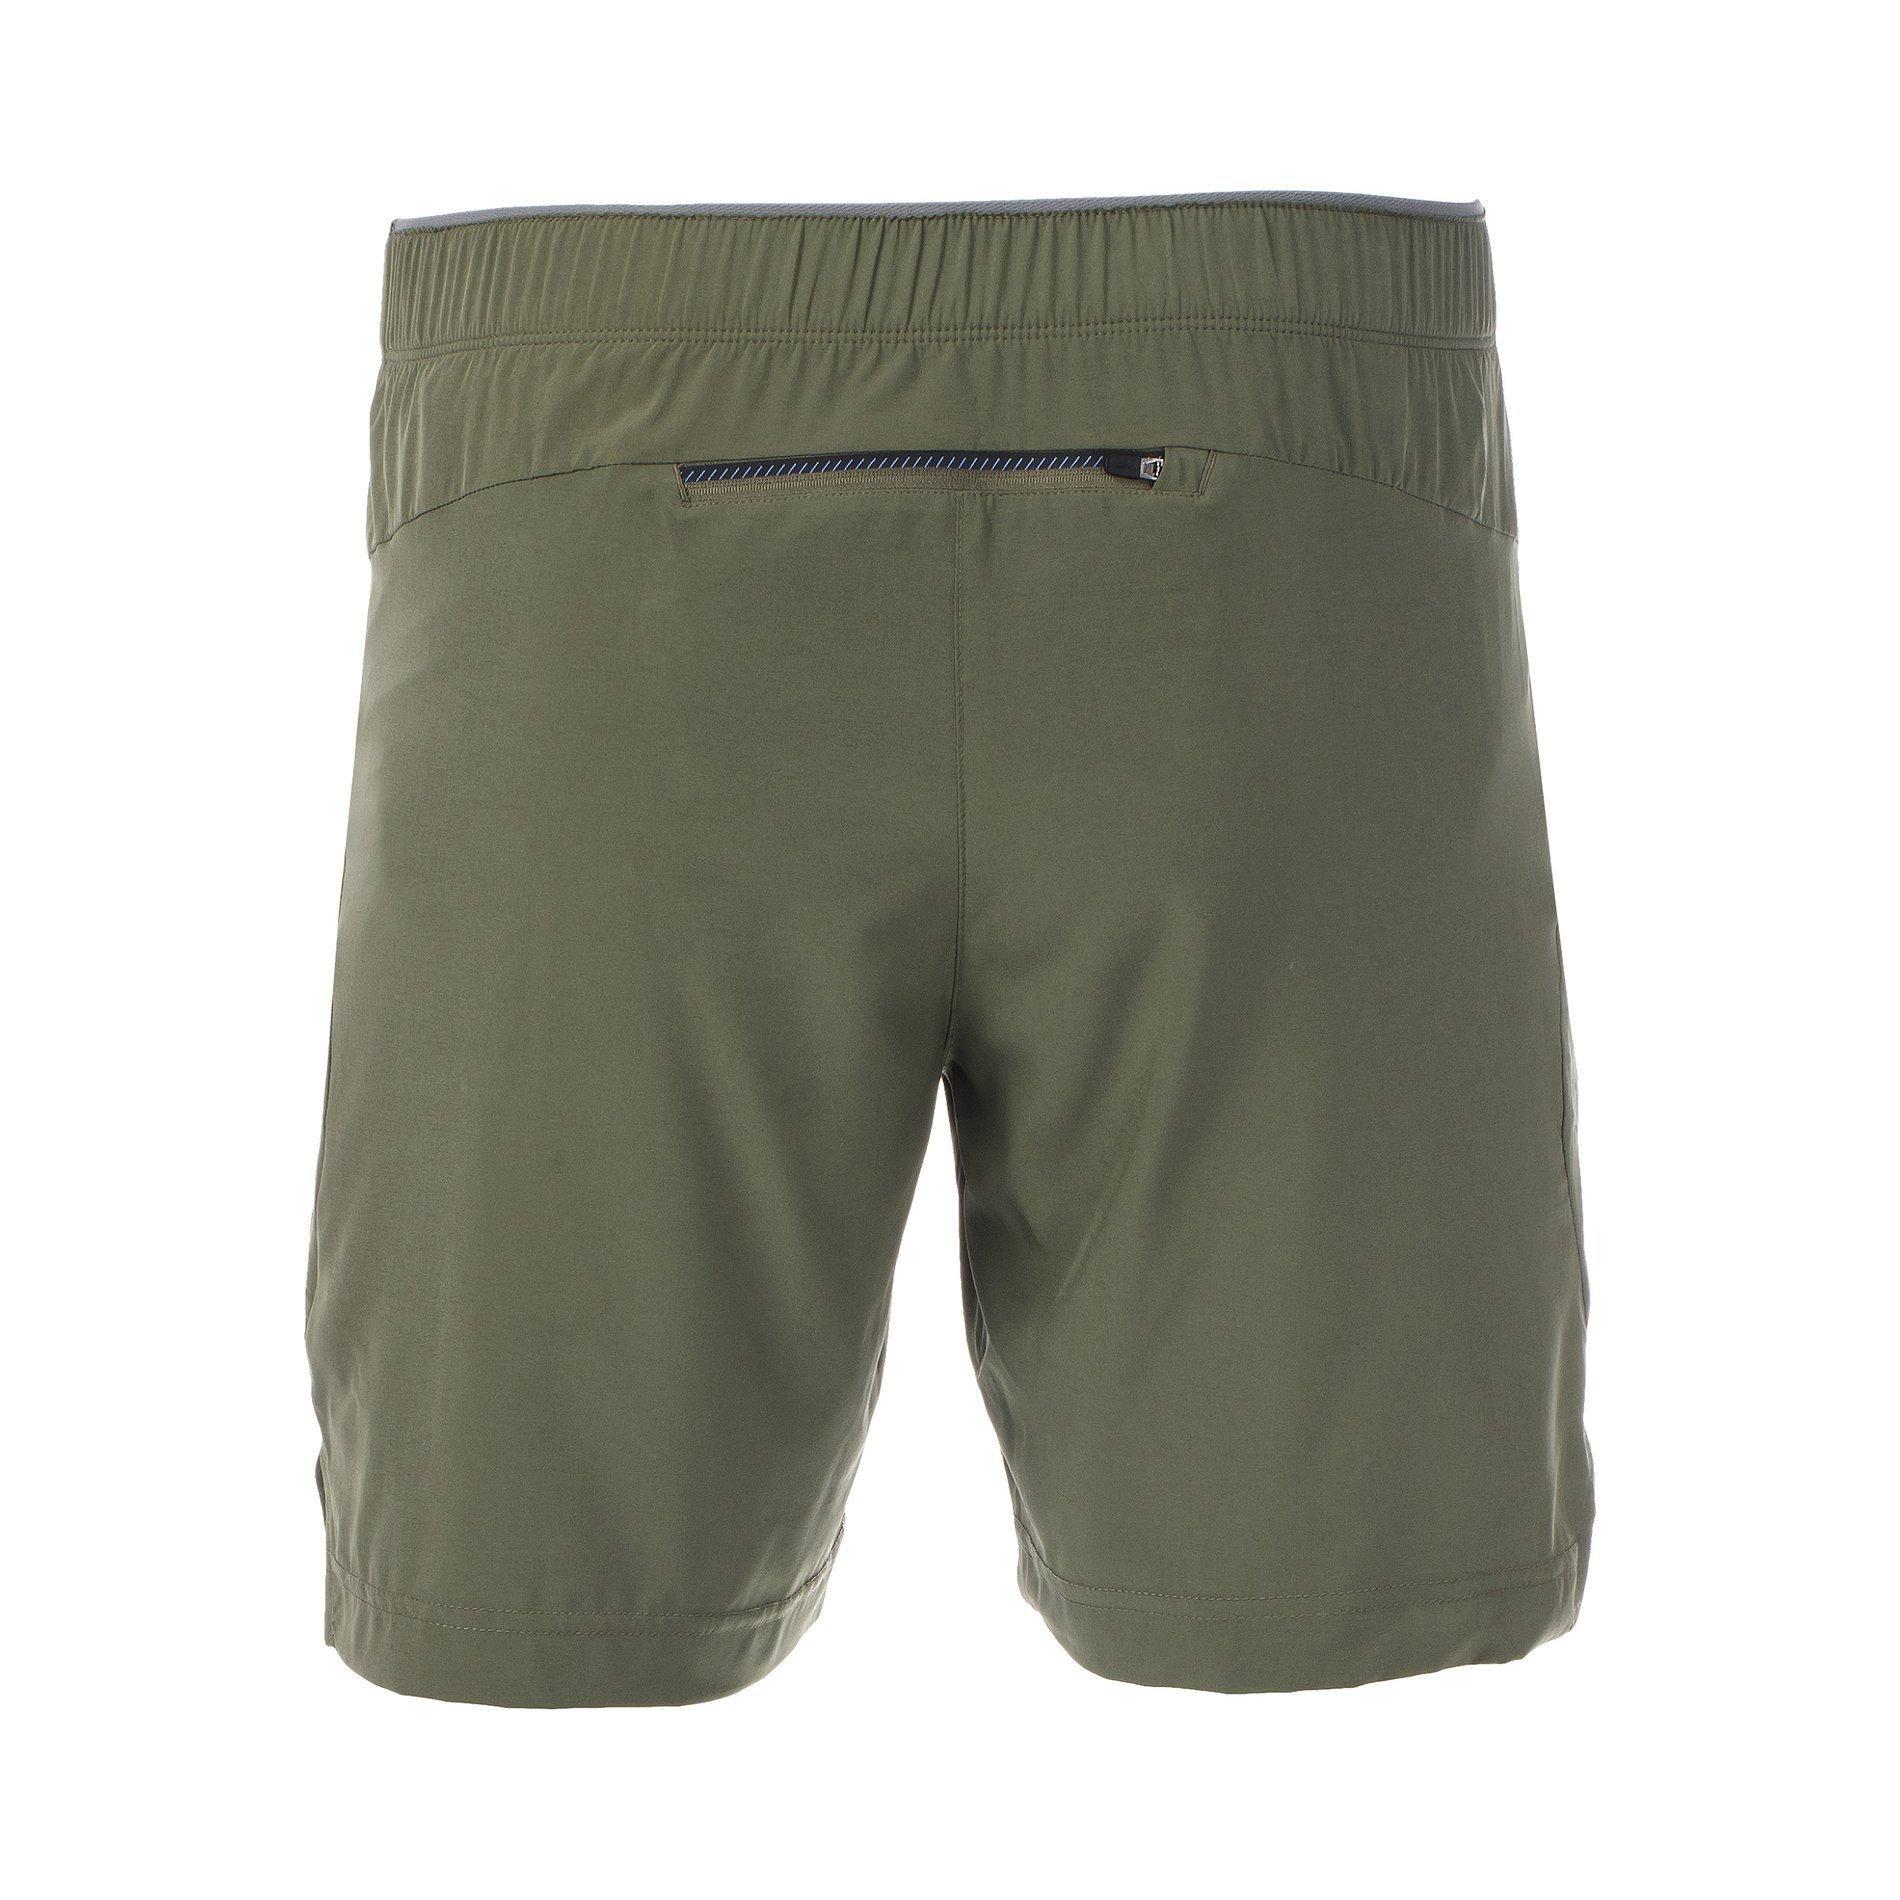 Black Mizuno Printed 7.5 Inch 2 In 1 Mens Running Shorts